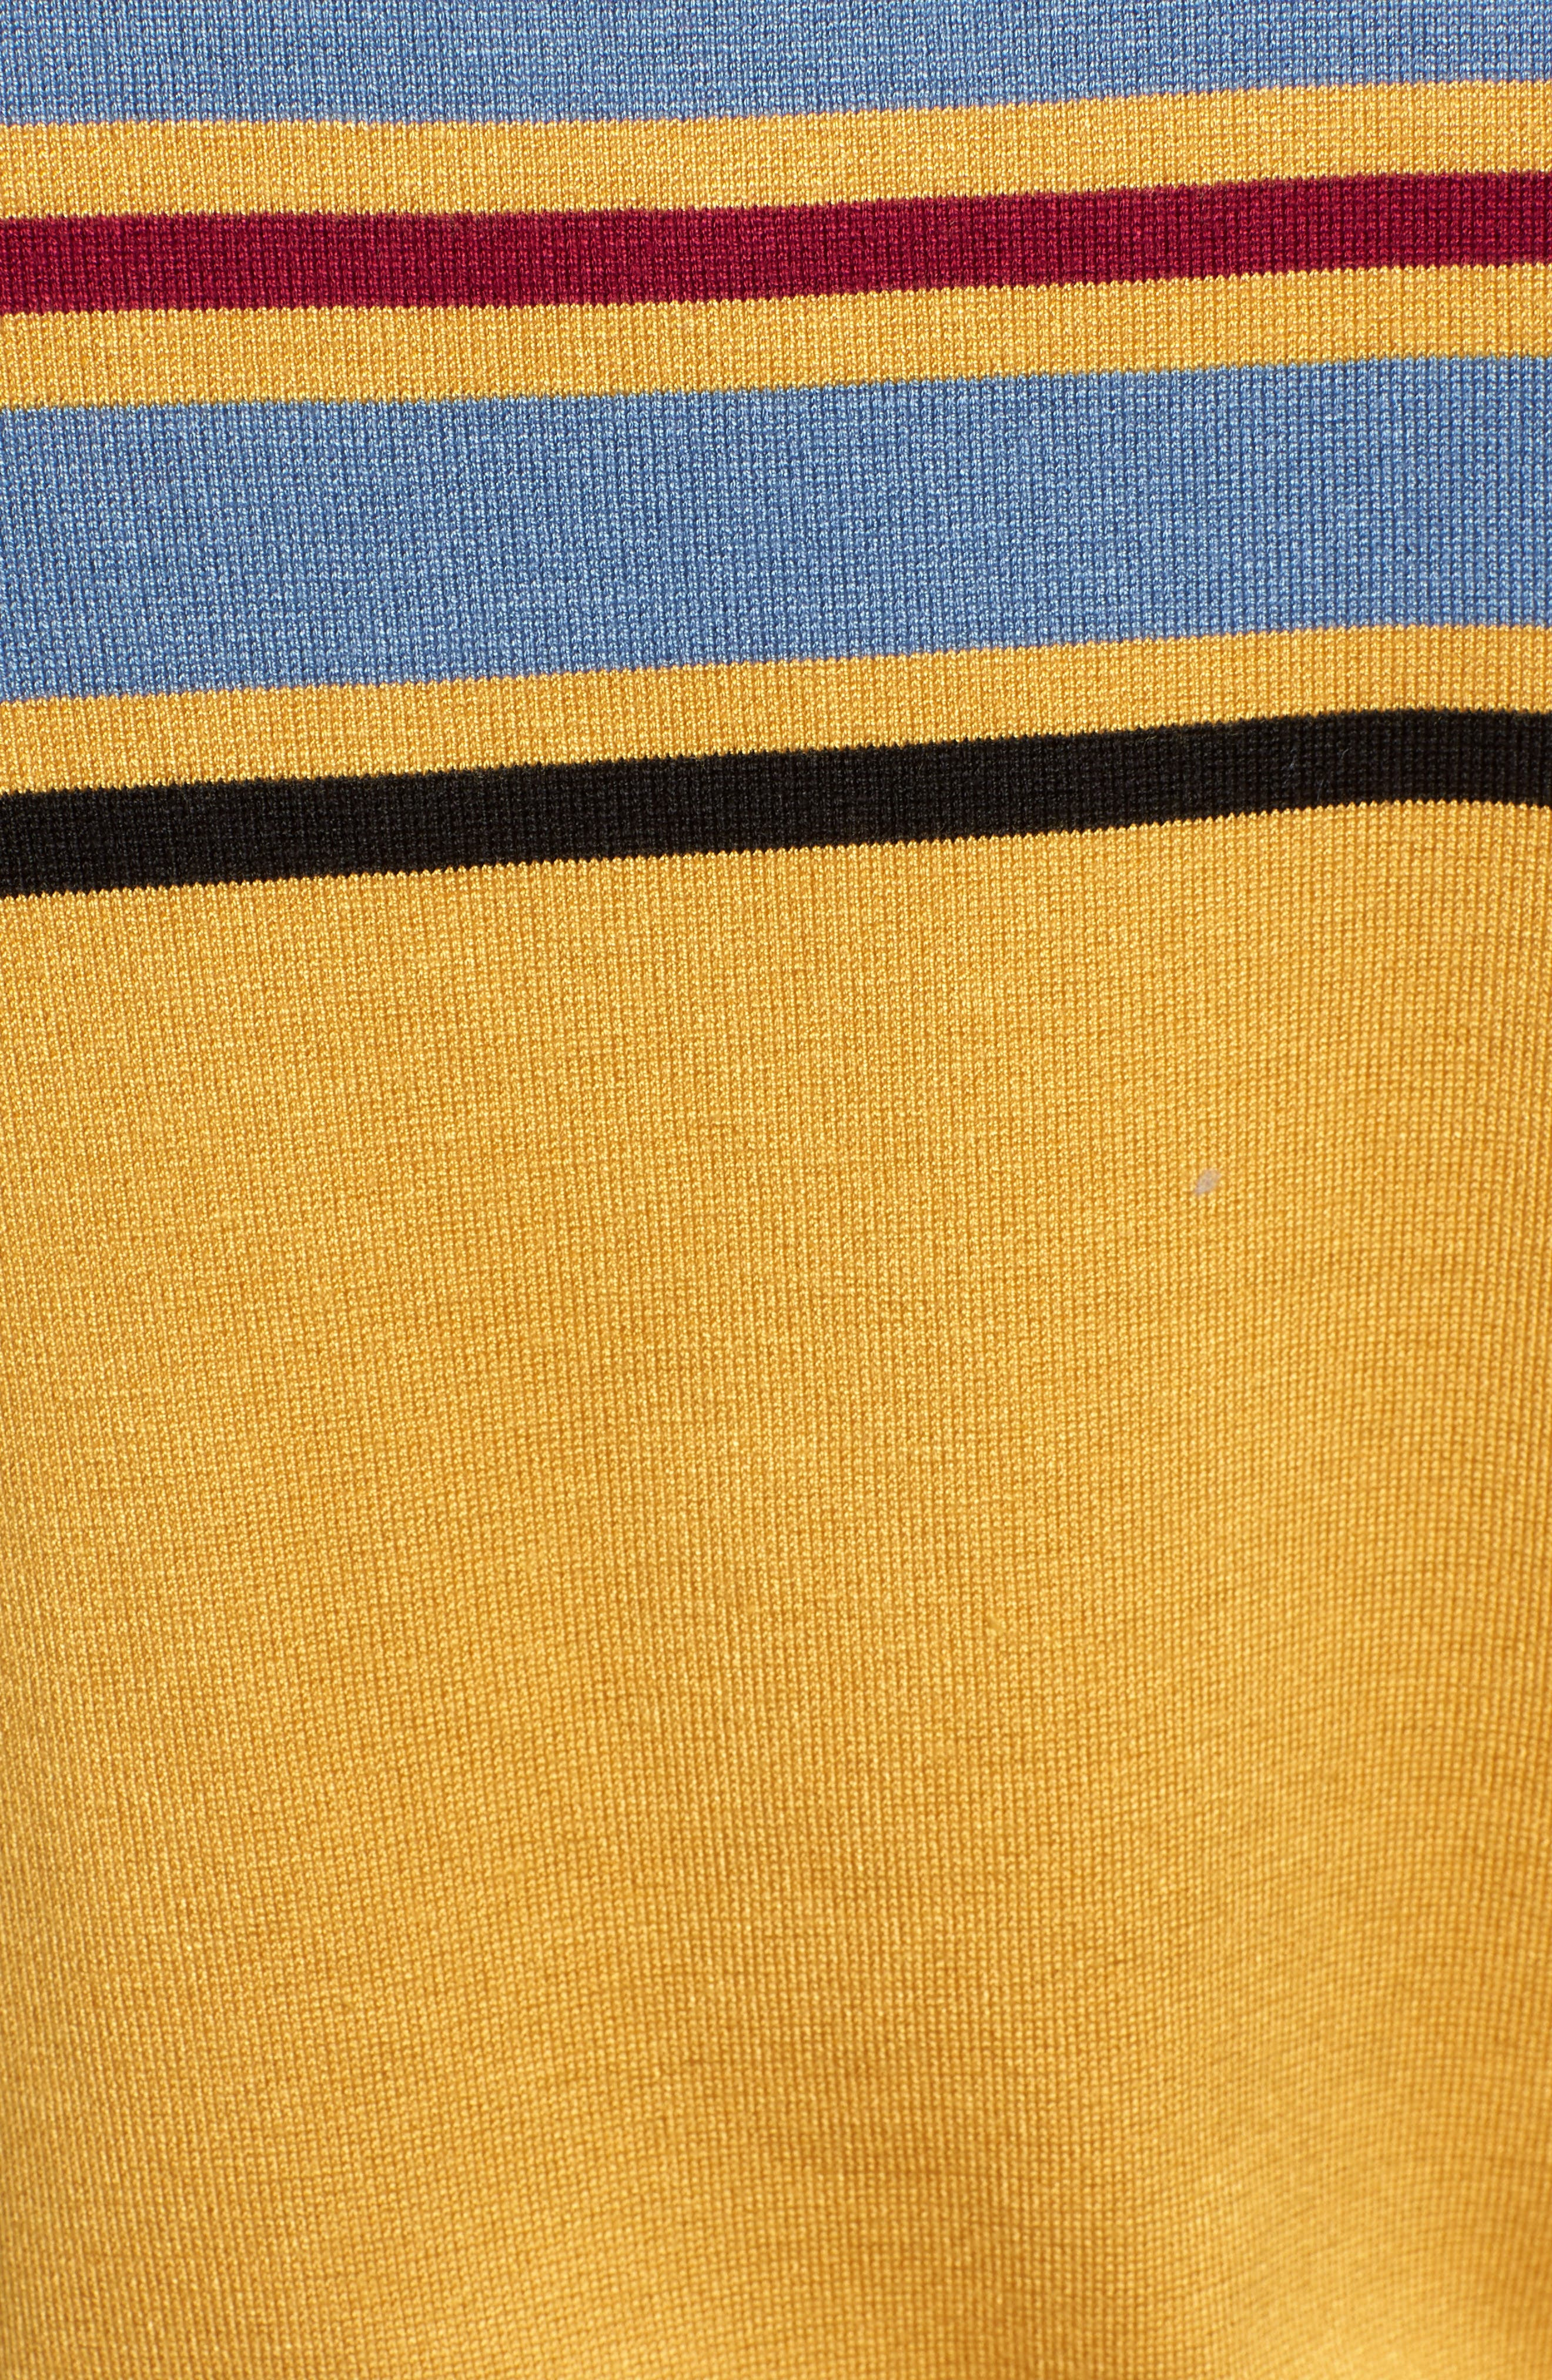 Skivvy Stripe Sweater,                             Alternate thumbnail 5, color,                             MUSTARD